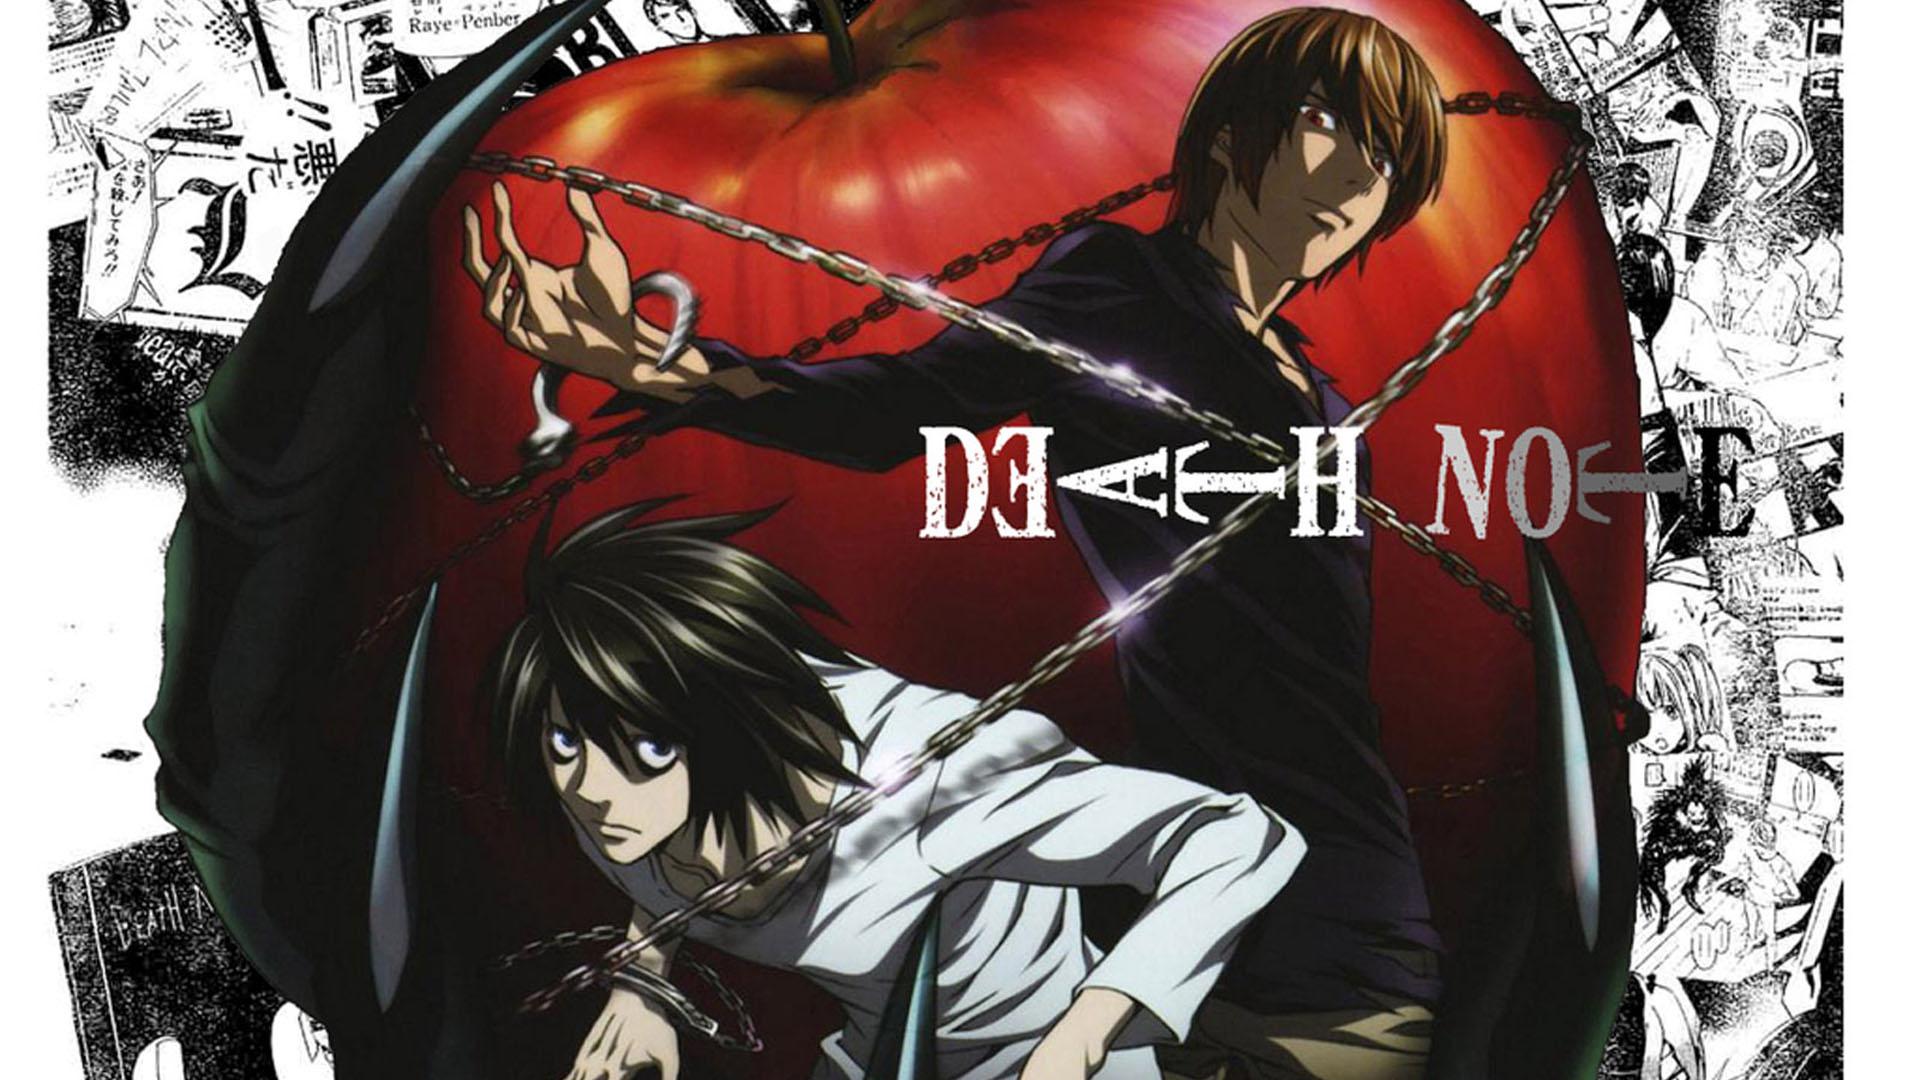 death note tsugumi ohba takshi obata manga anime arte filme netflix (3)